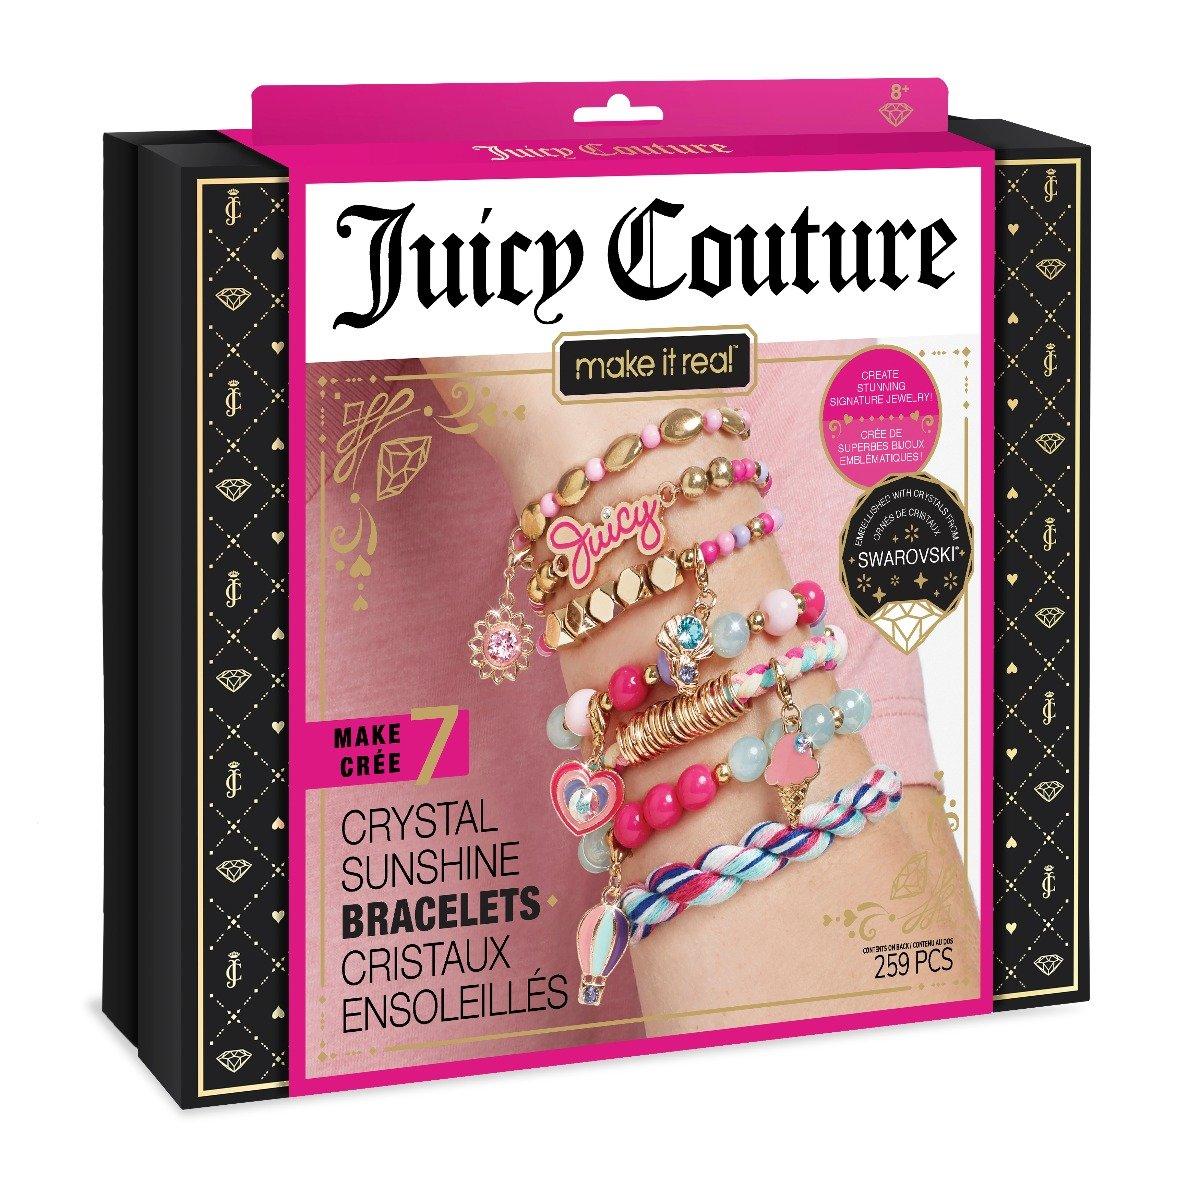 Set de creatie Maket it Real Juicy Couture Summer Passion. Bratari